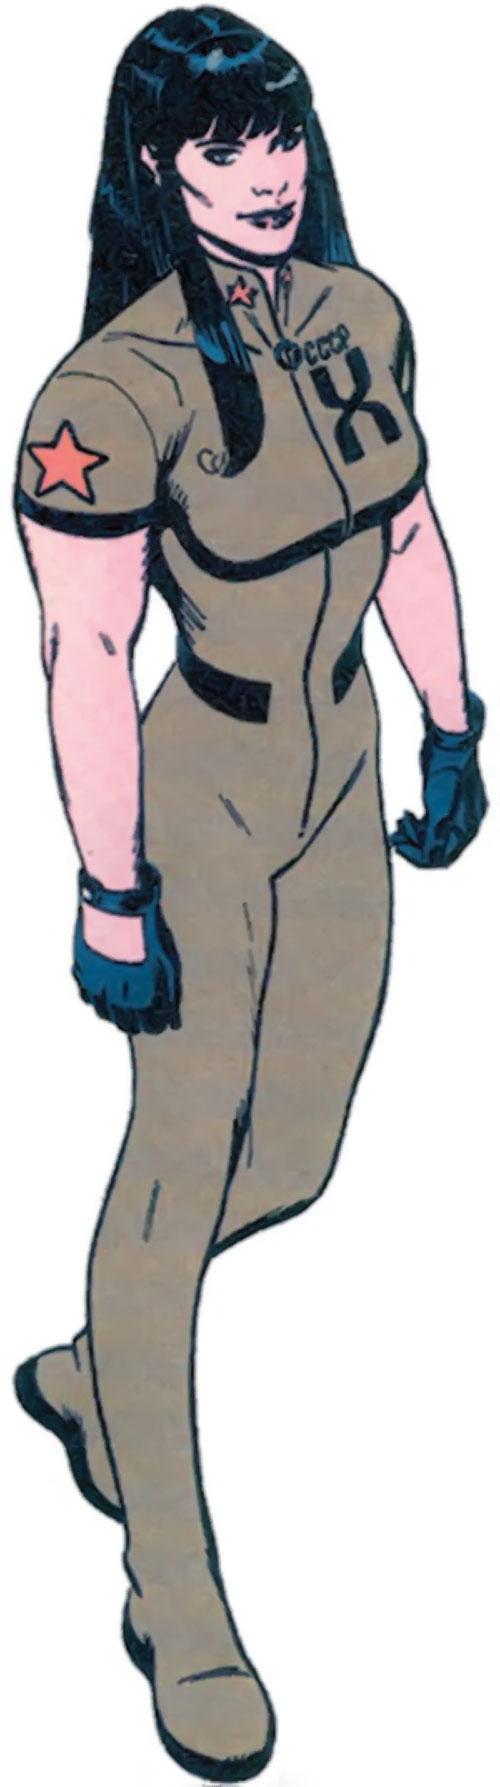 Svetlana X (Tom Strong ally)